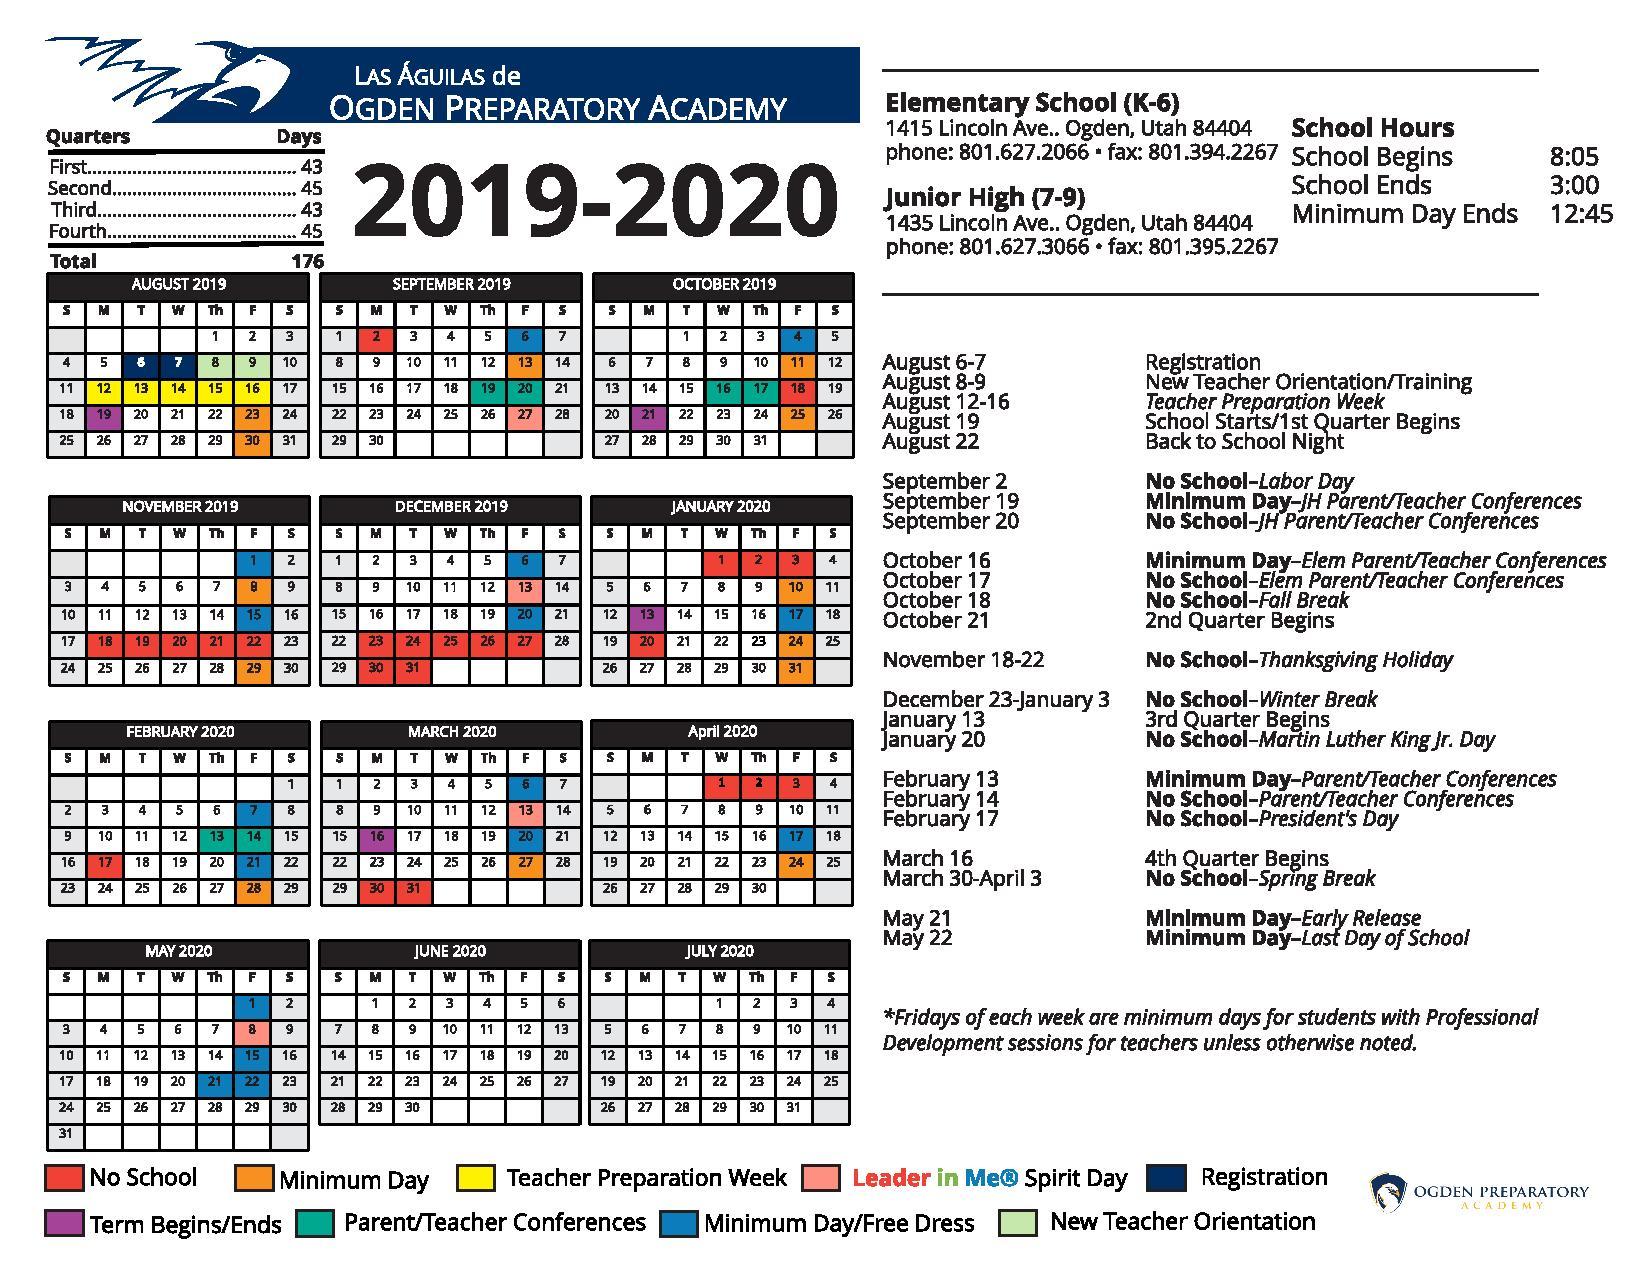 Calendario 2020trackidsp 006.2019 2020 Opa School Calendar Updated Ogden Preparatory